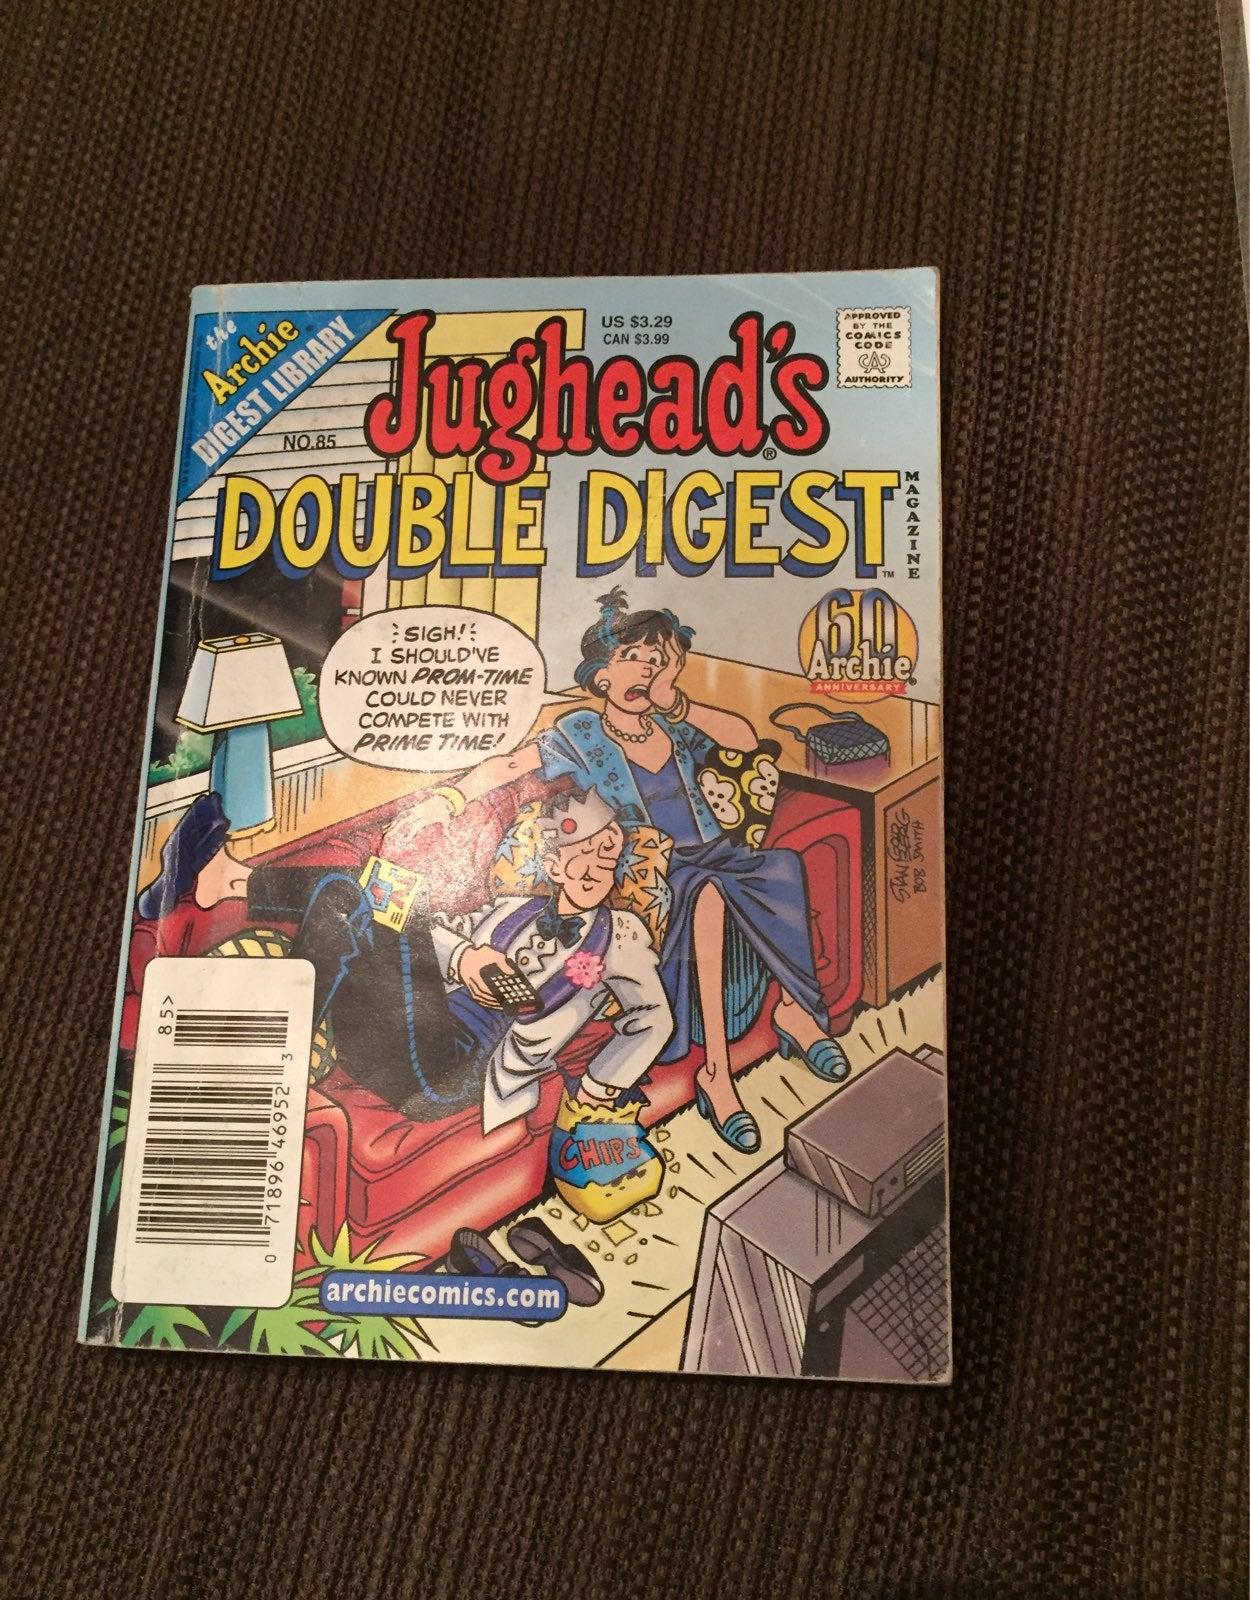 Jughead's Double digest no. 85